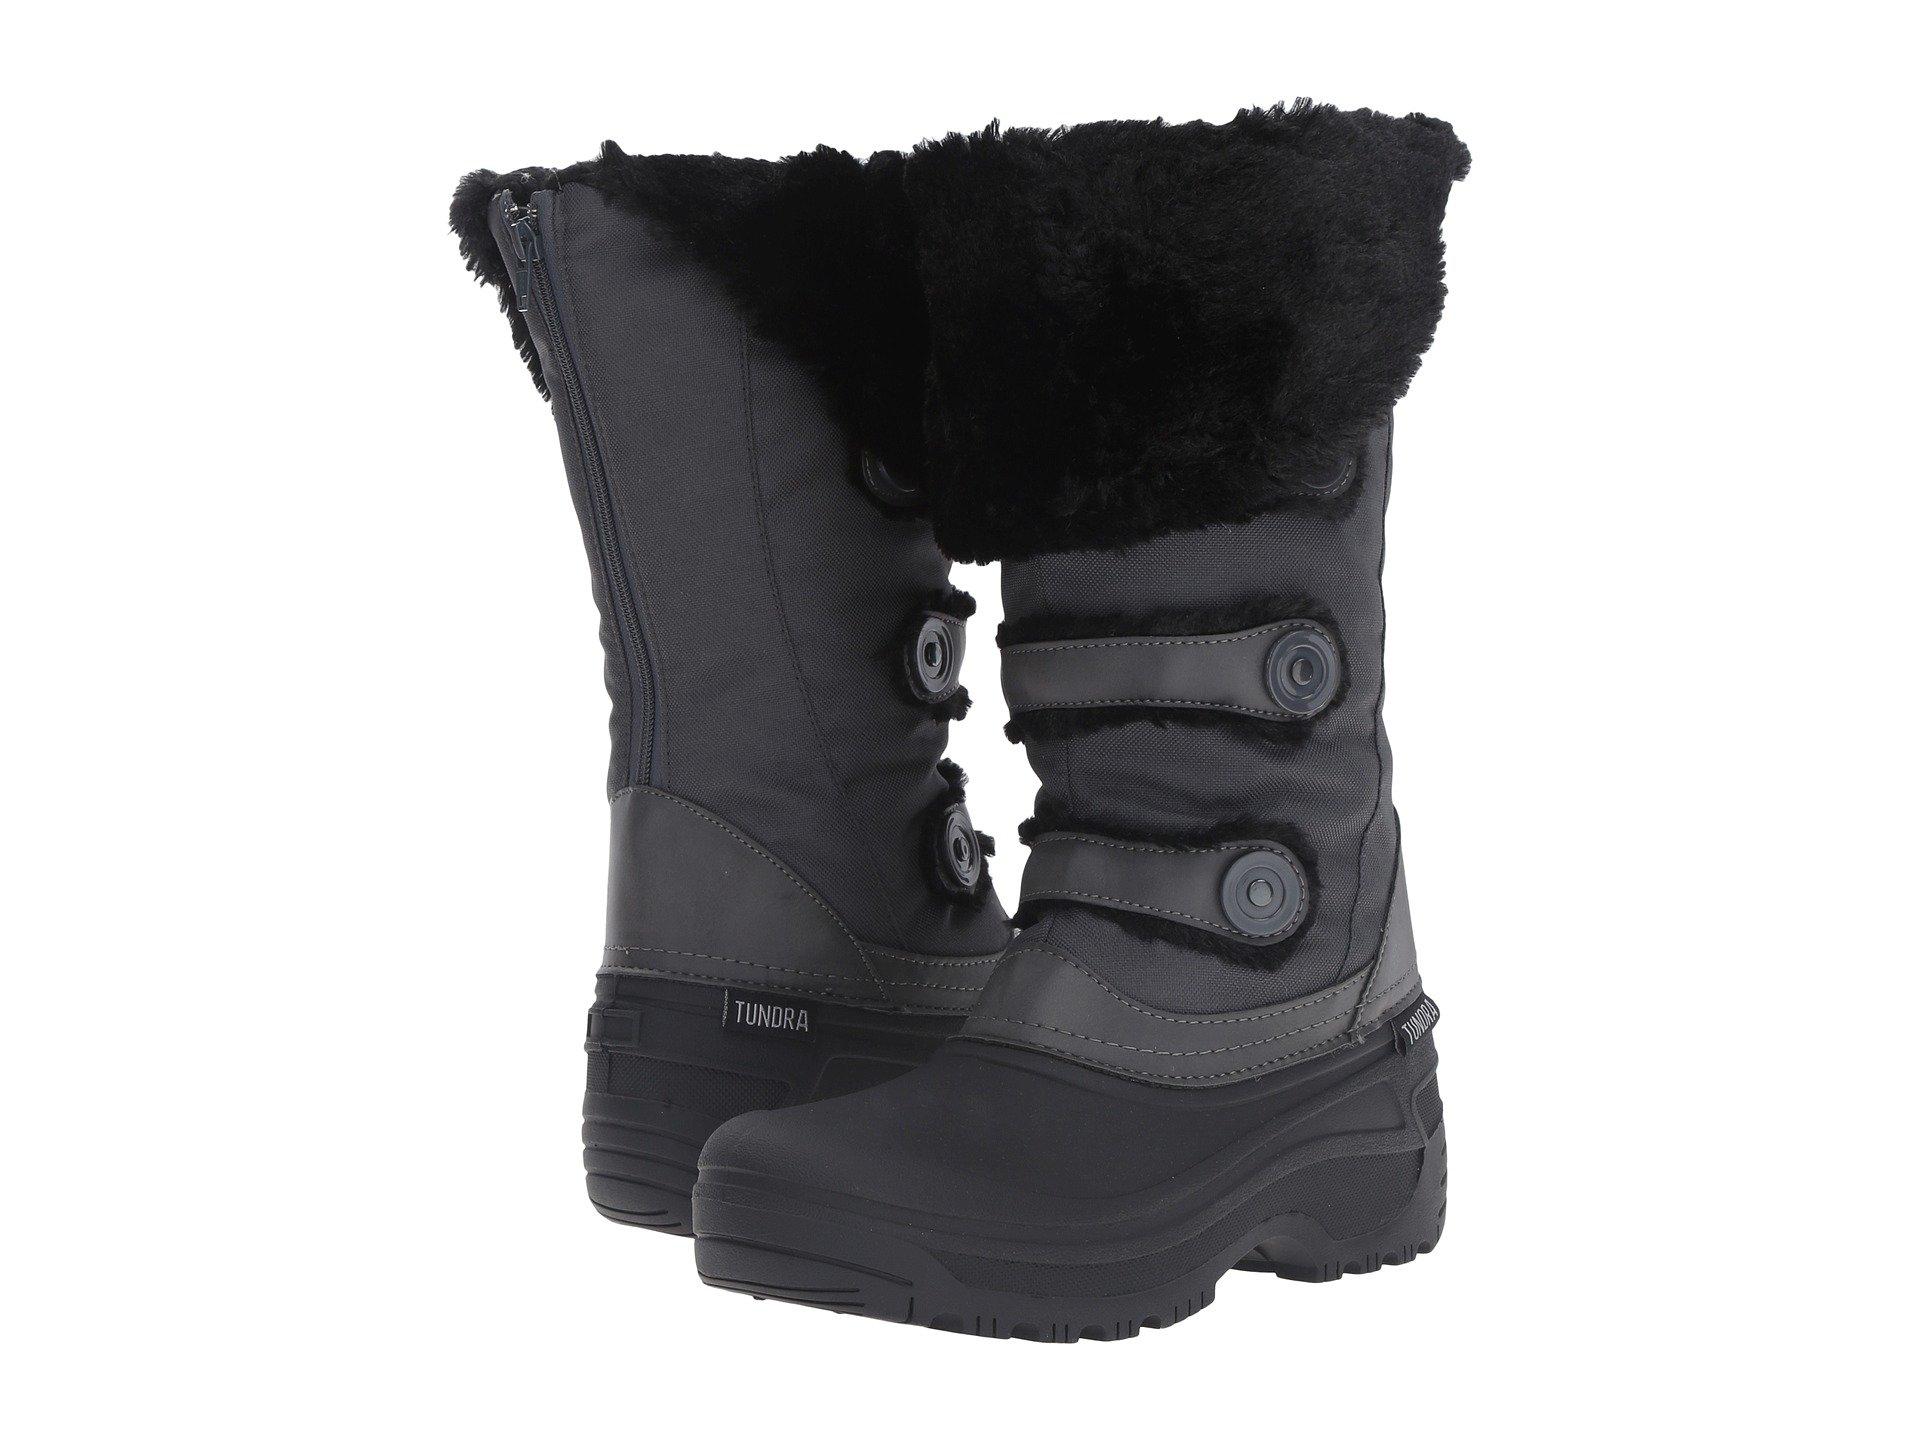 Tundra Boots Ella (Black/Charcoal) Women's Boots